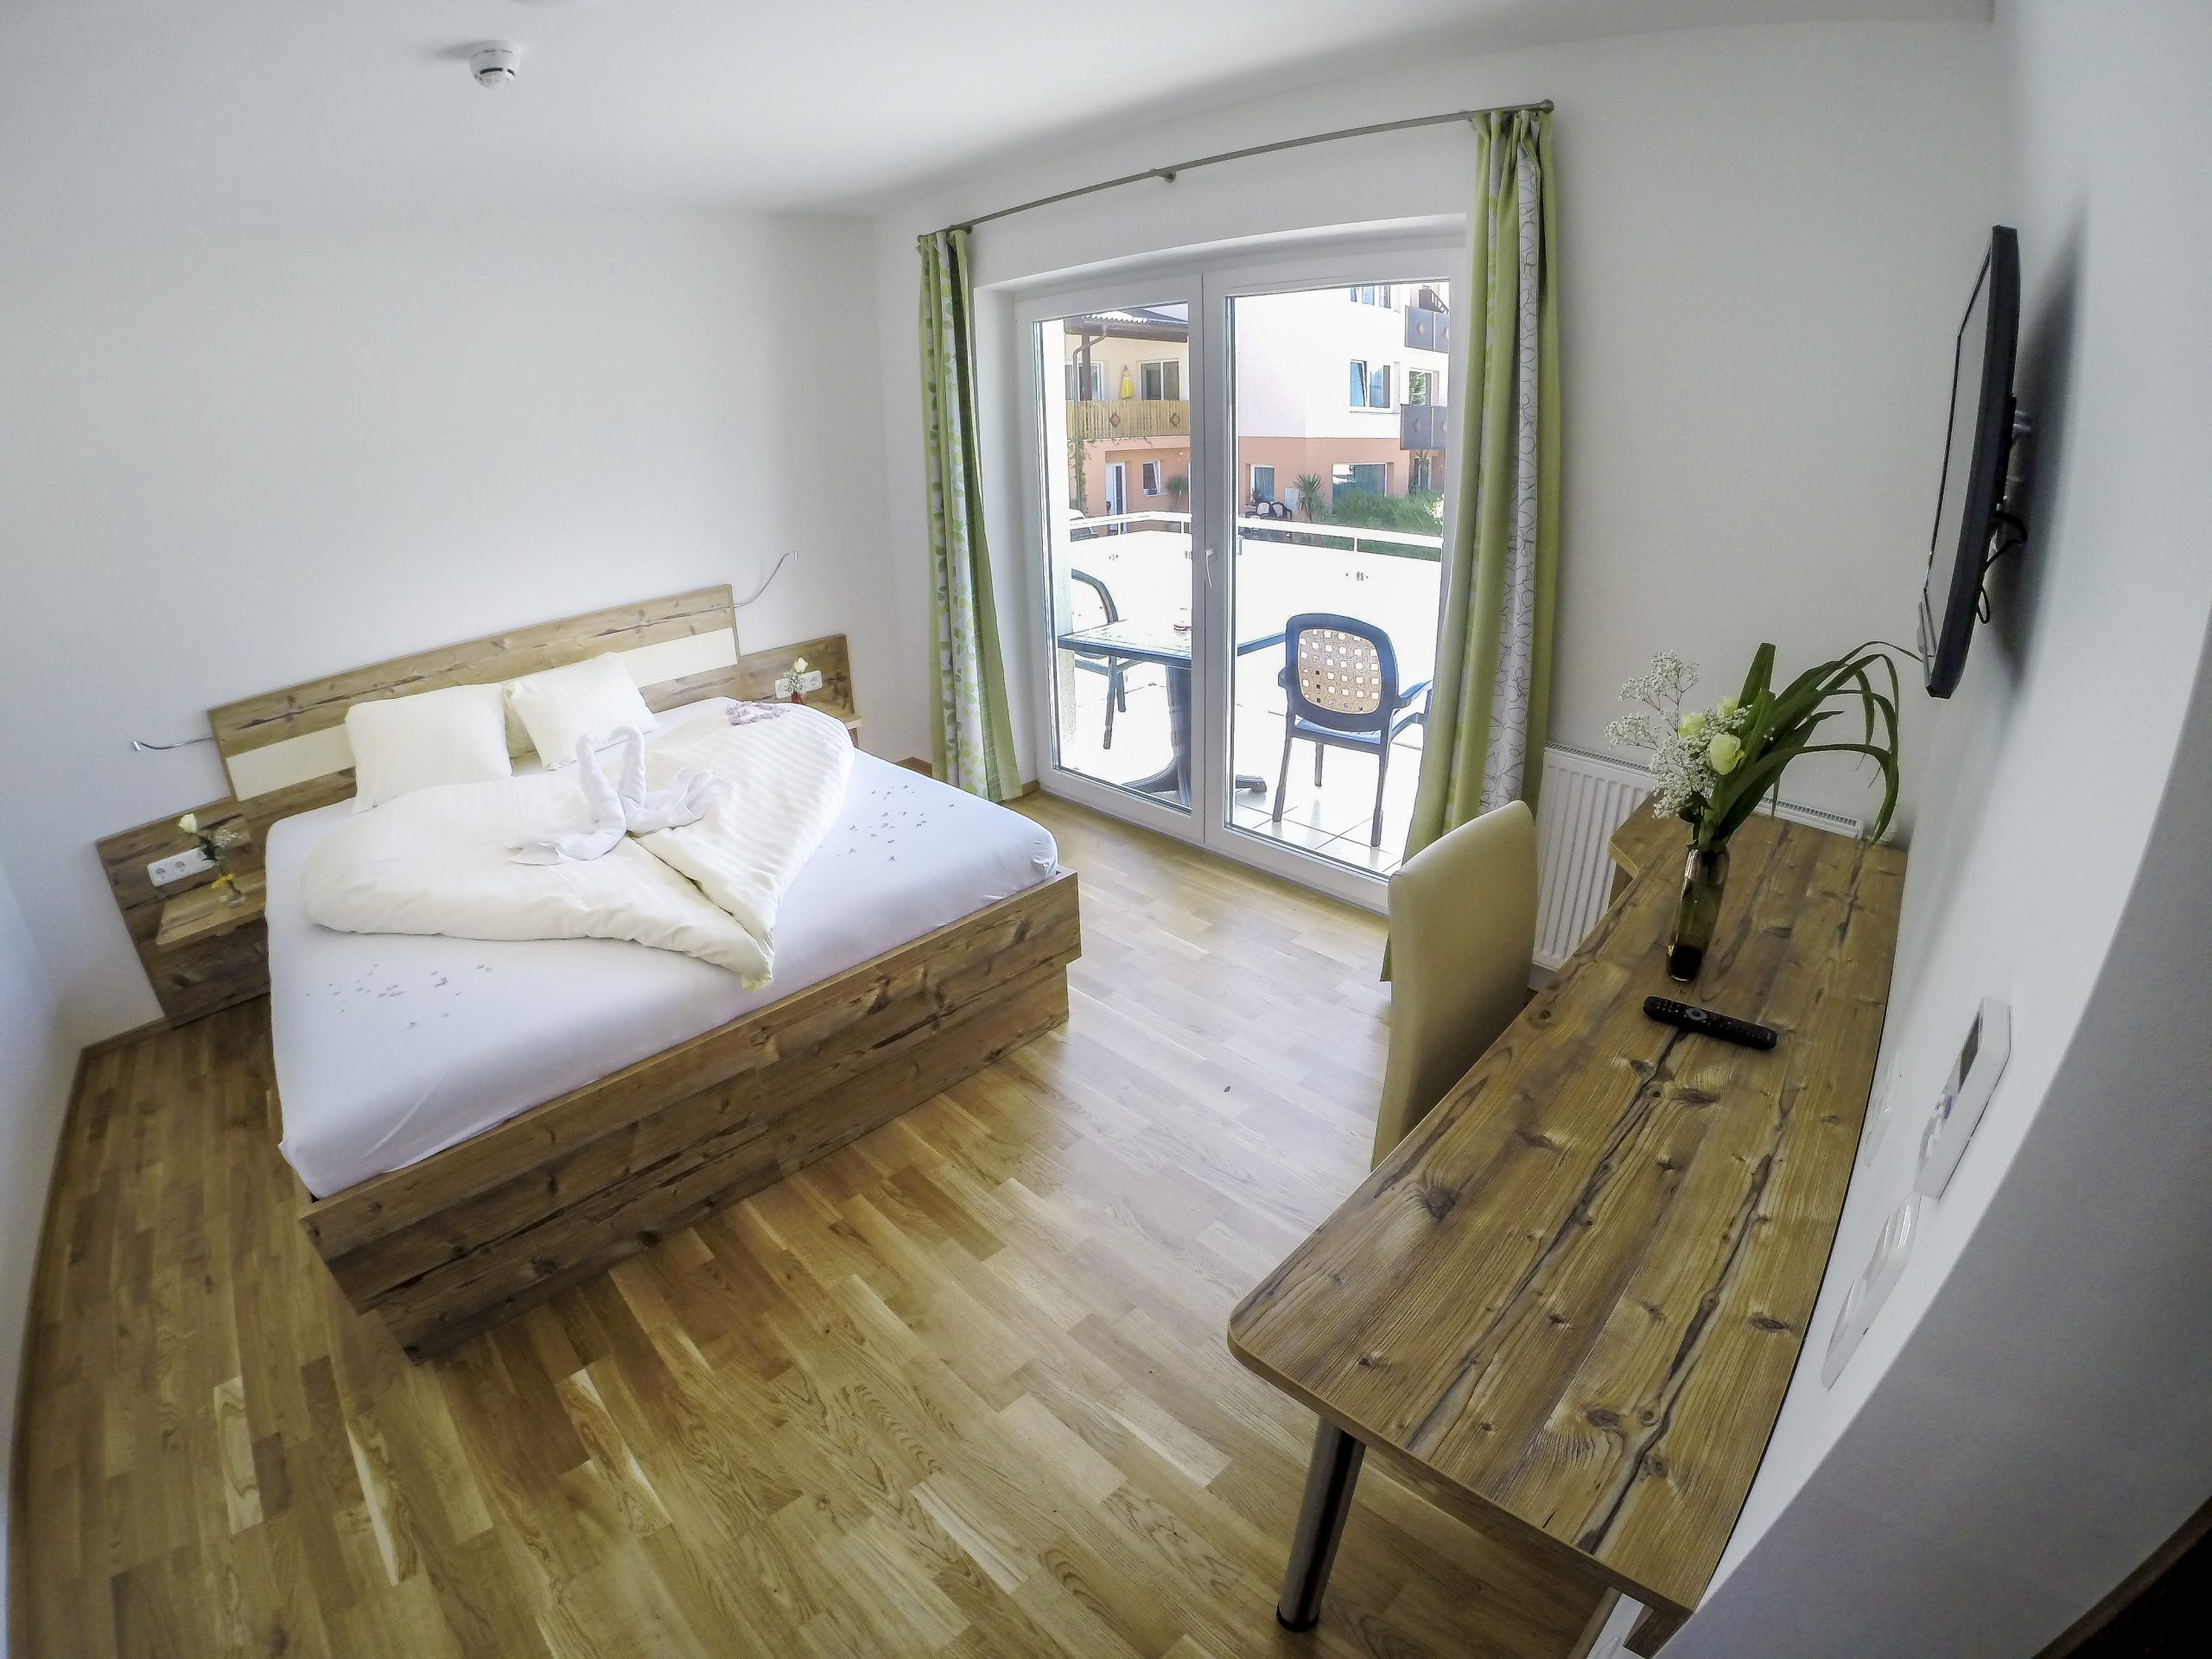 New double room with balcony